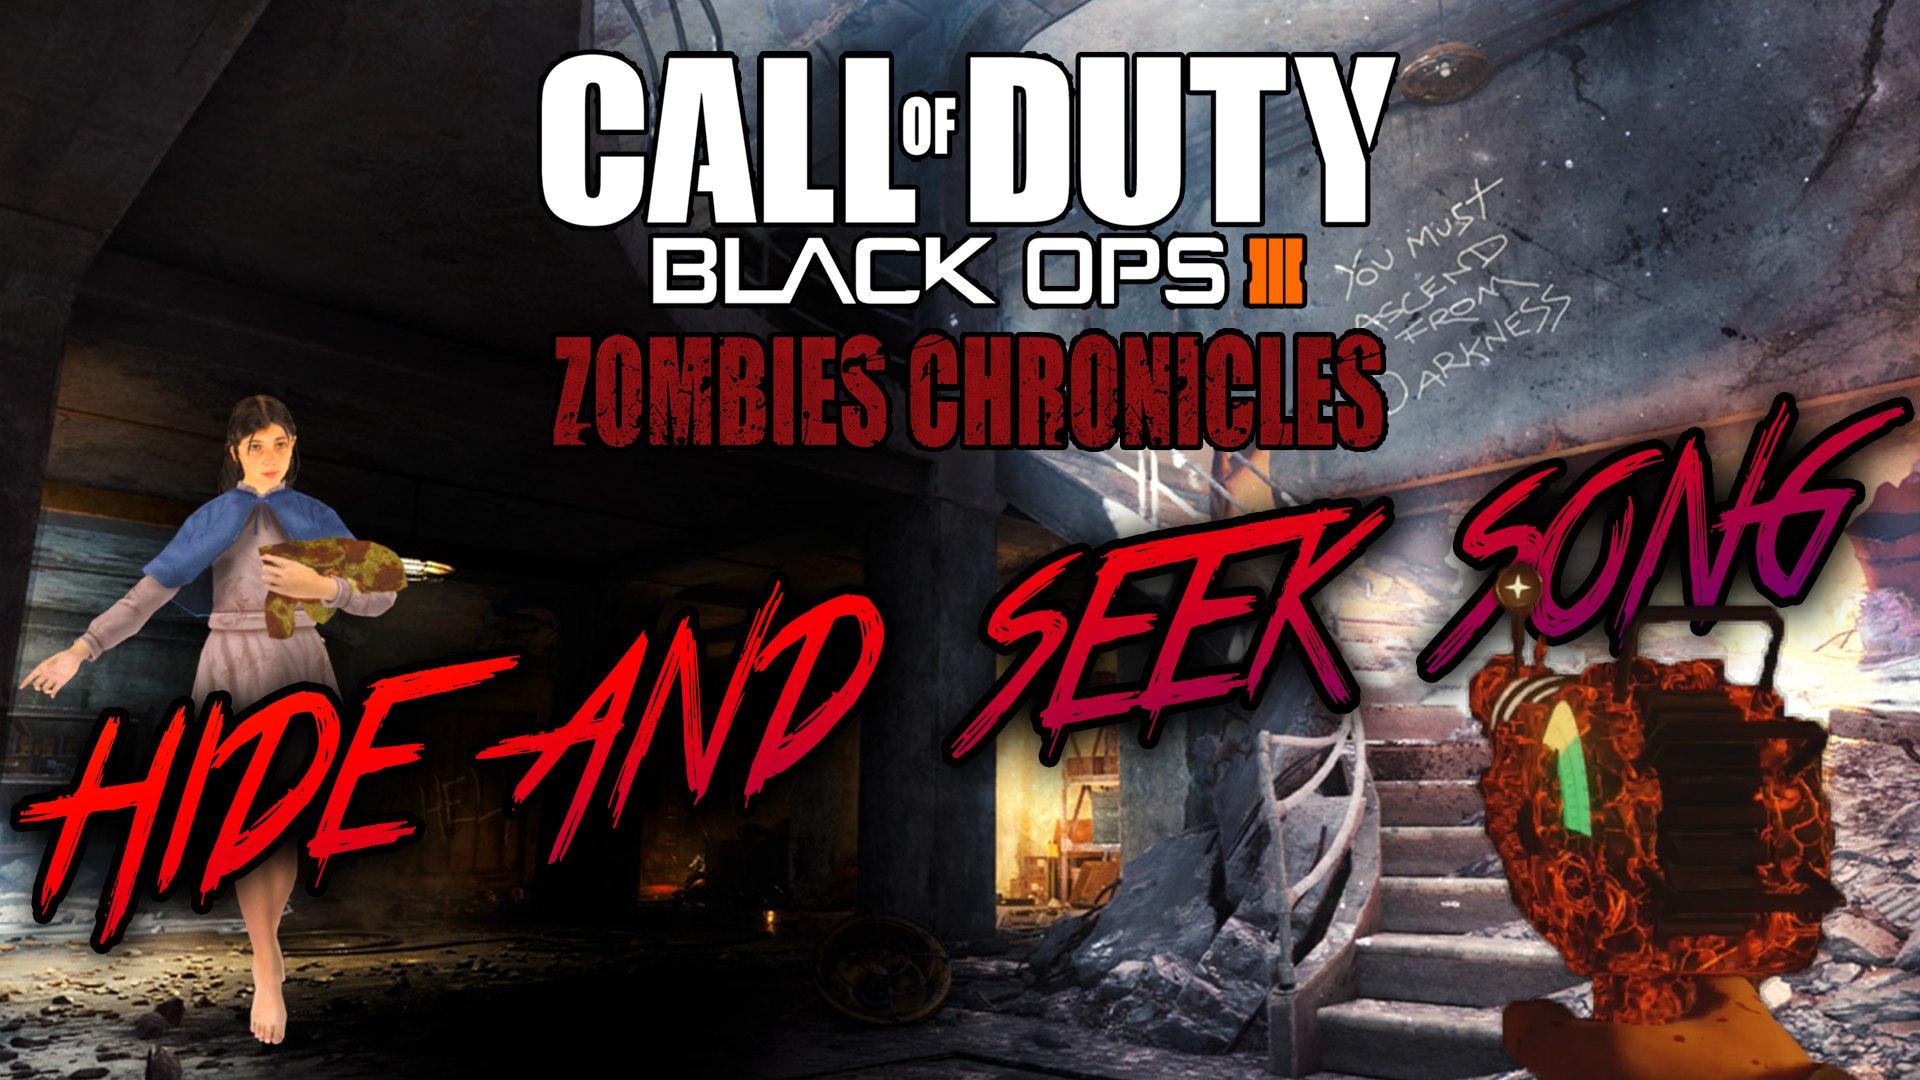 NACHT DER UNTOTEN - SECRET SAMANTHA'S HIDE AND SEEK EASTER EGG SONG (Black  Ops 3 Zombies Chronicles)